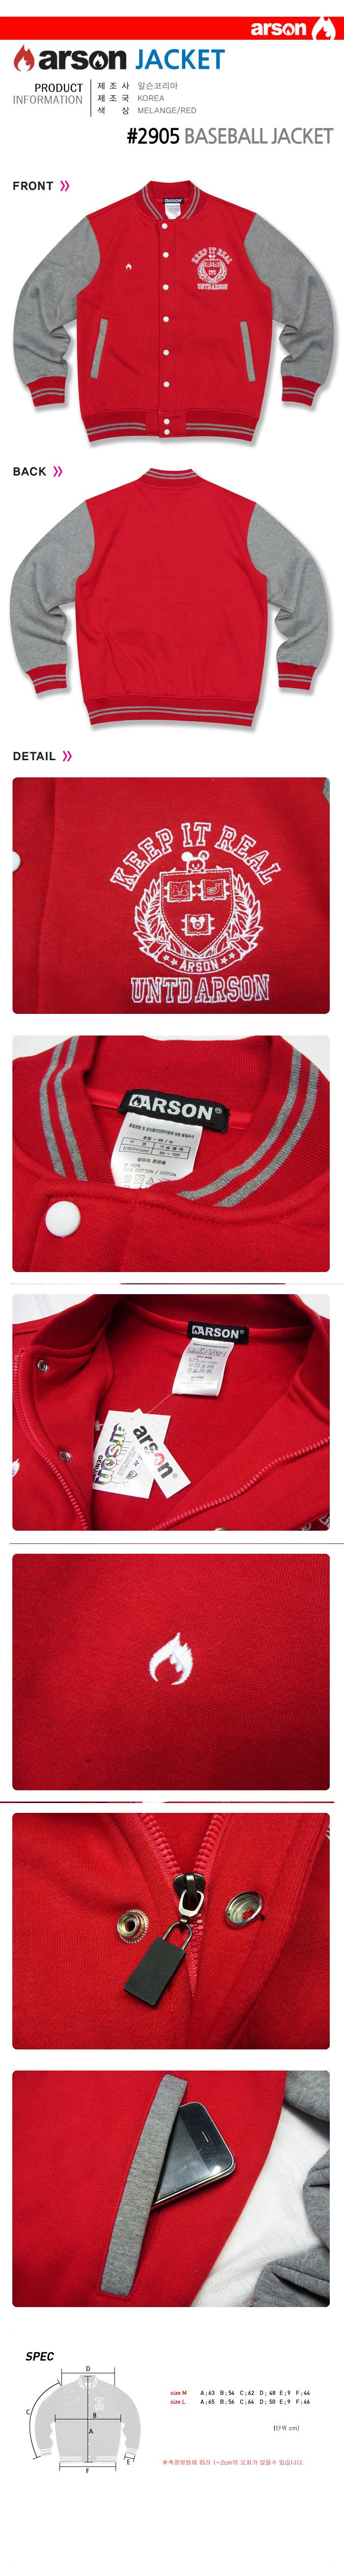 [ ARSON ] [ARSON] C2905  BASEBALL JACKET Stadium Jacket